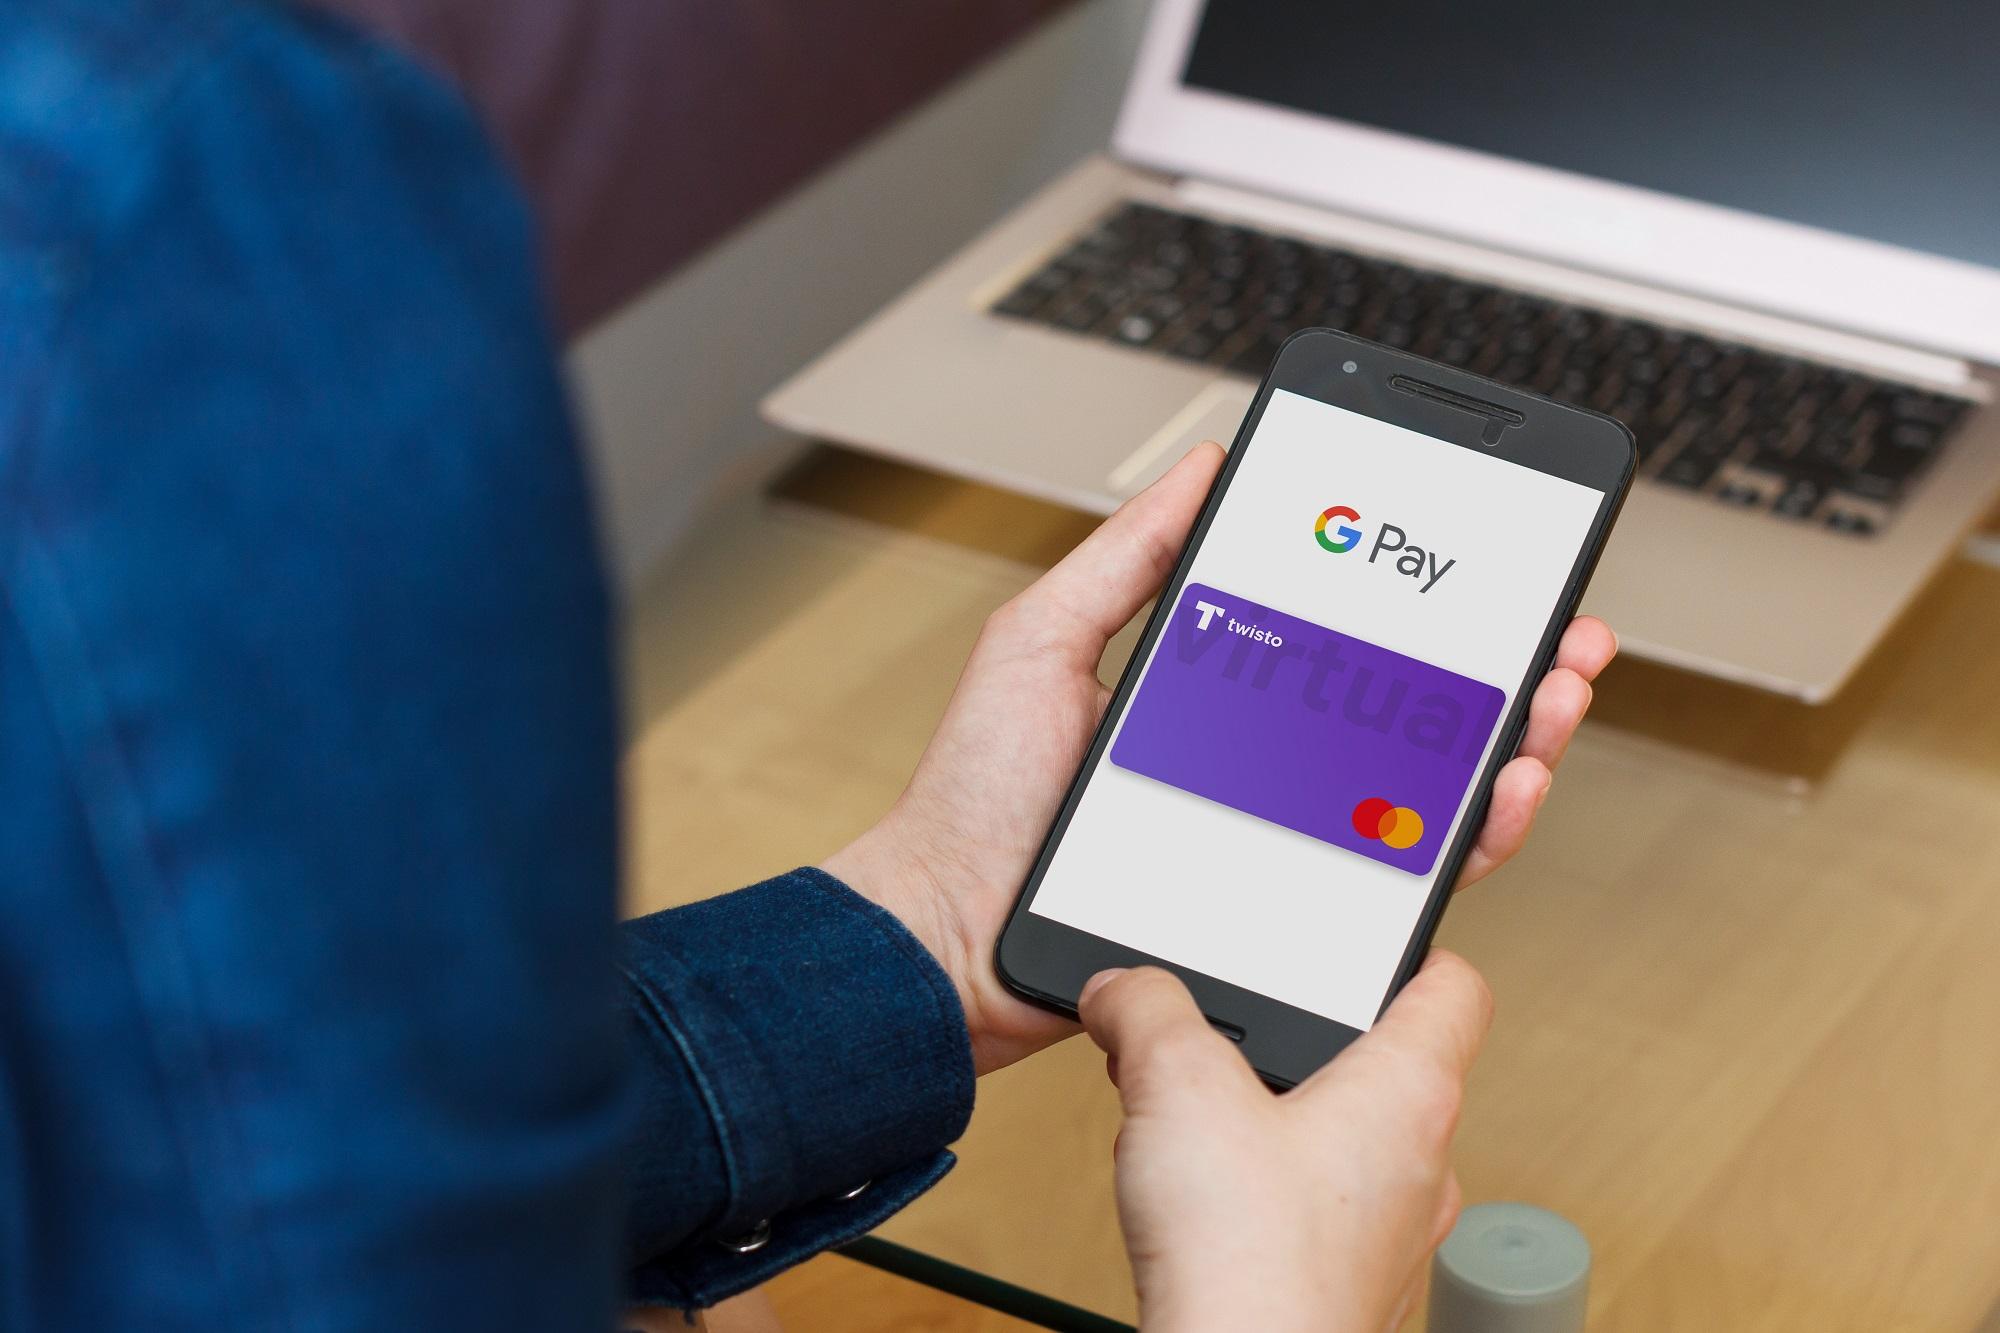 Twisto Google Pay